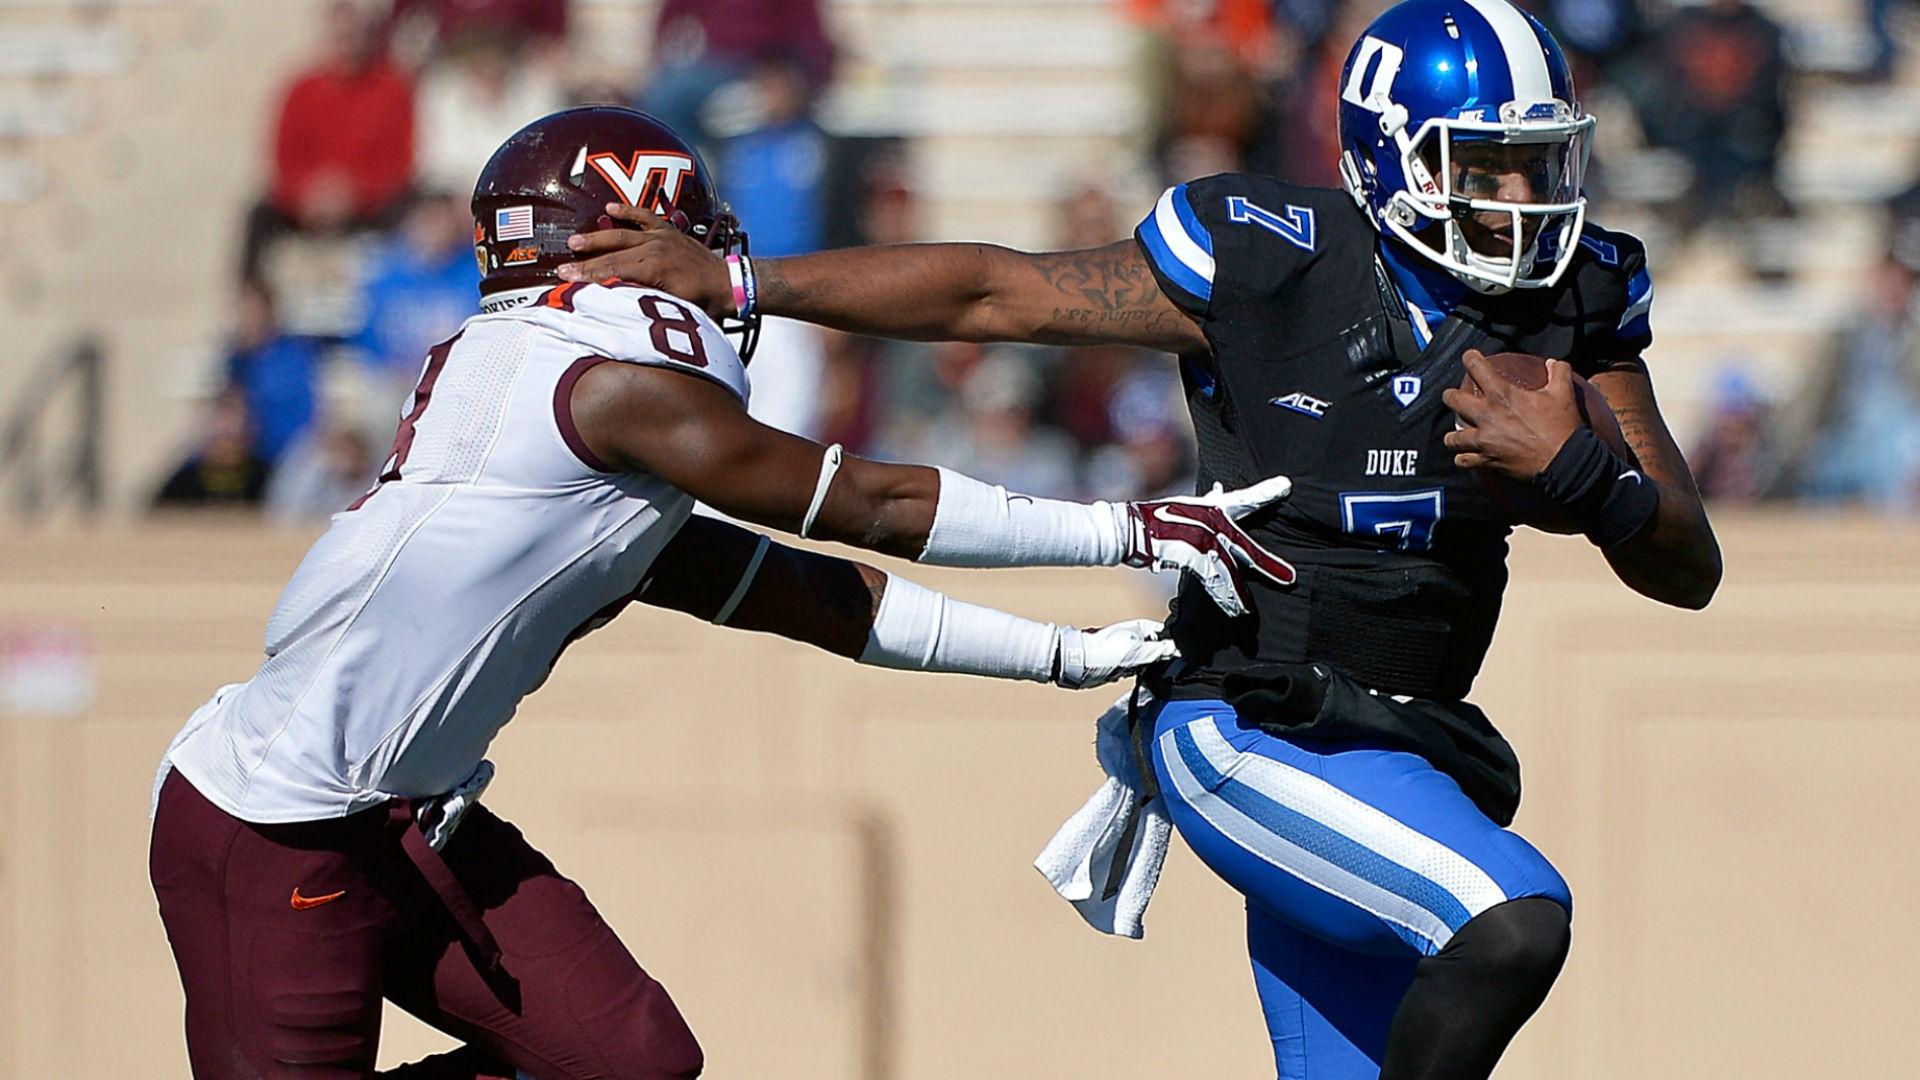 North Carolina at Duke betting preview and pick – Blue Devils still chasing ACC Coastal crown